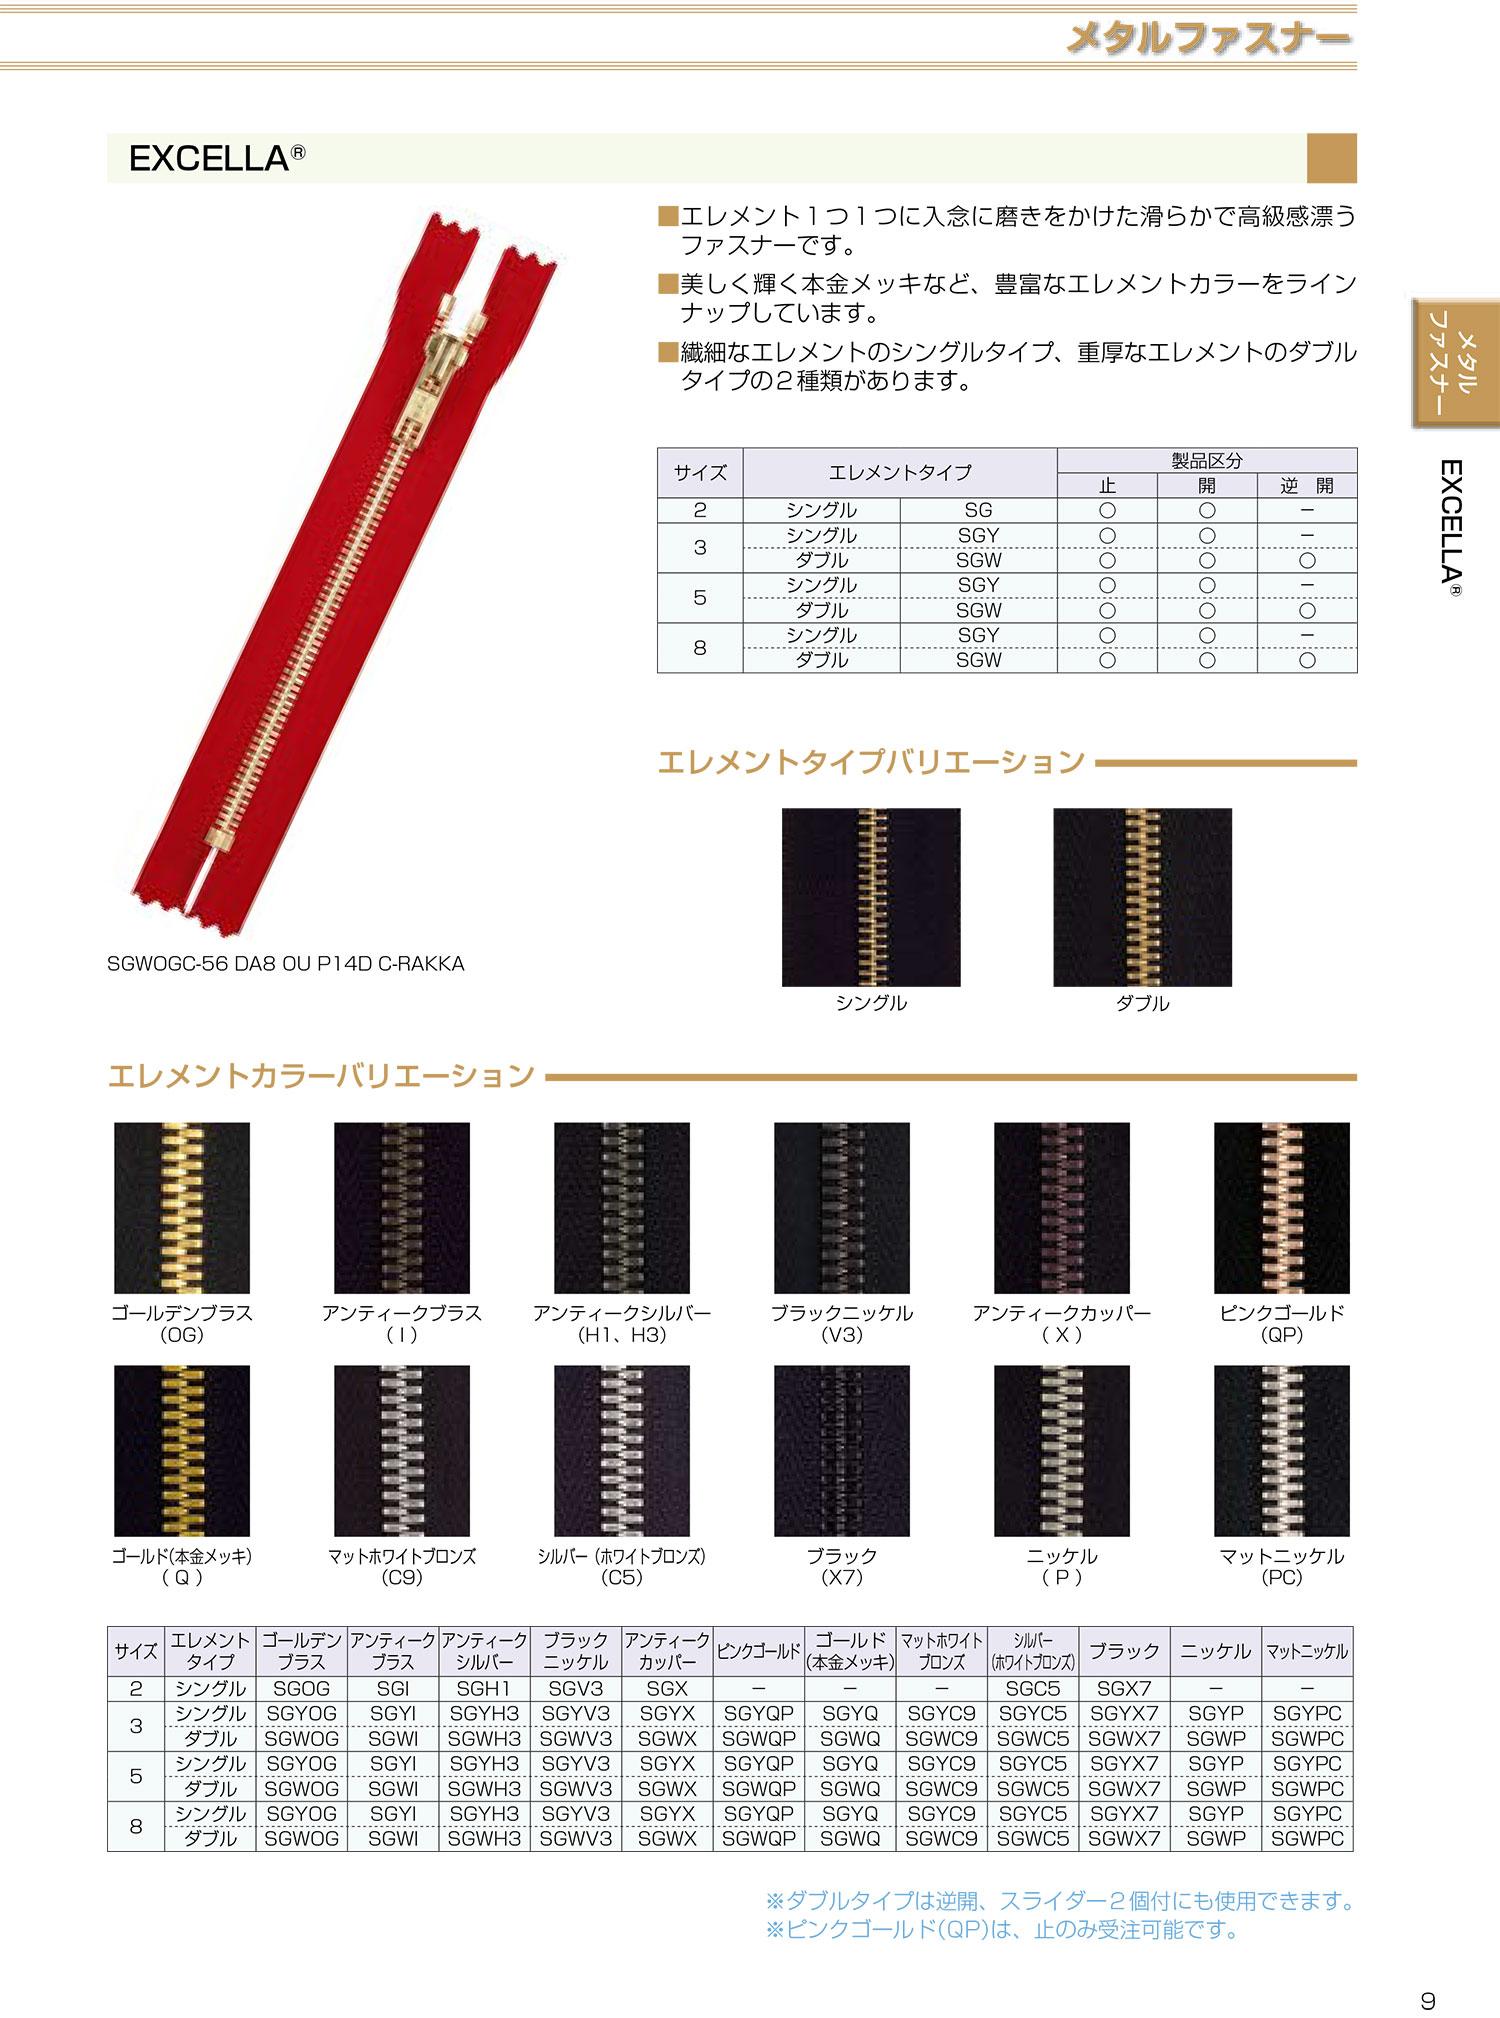 3SGWPMR エクセラ 3サイズ ニッケル 逆開 ダブル[ファスナー] YKK/オークラ商事 - ApparelX アパレル資材卸通販